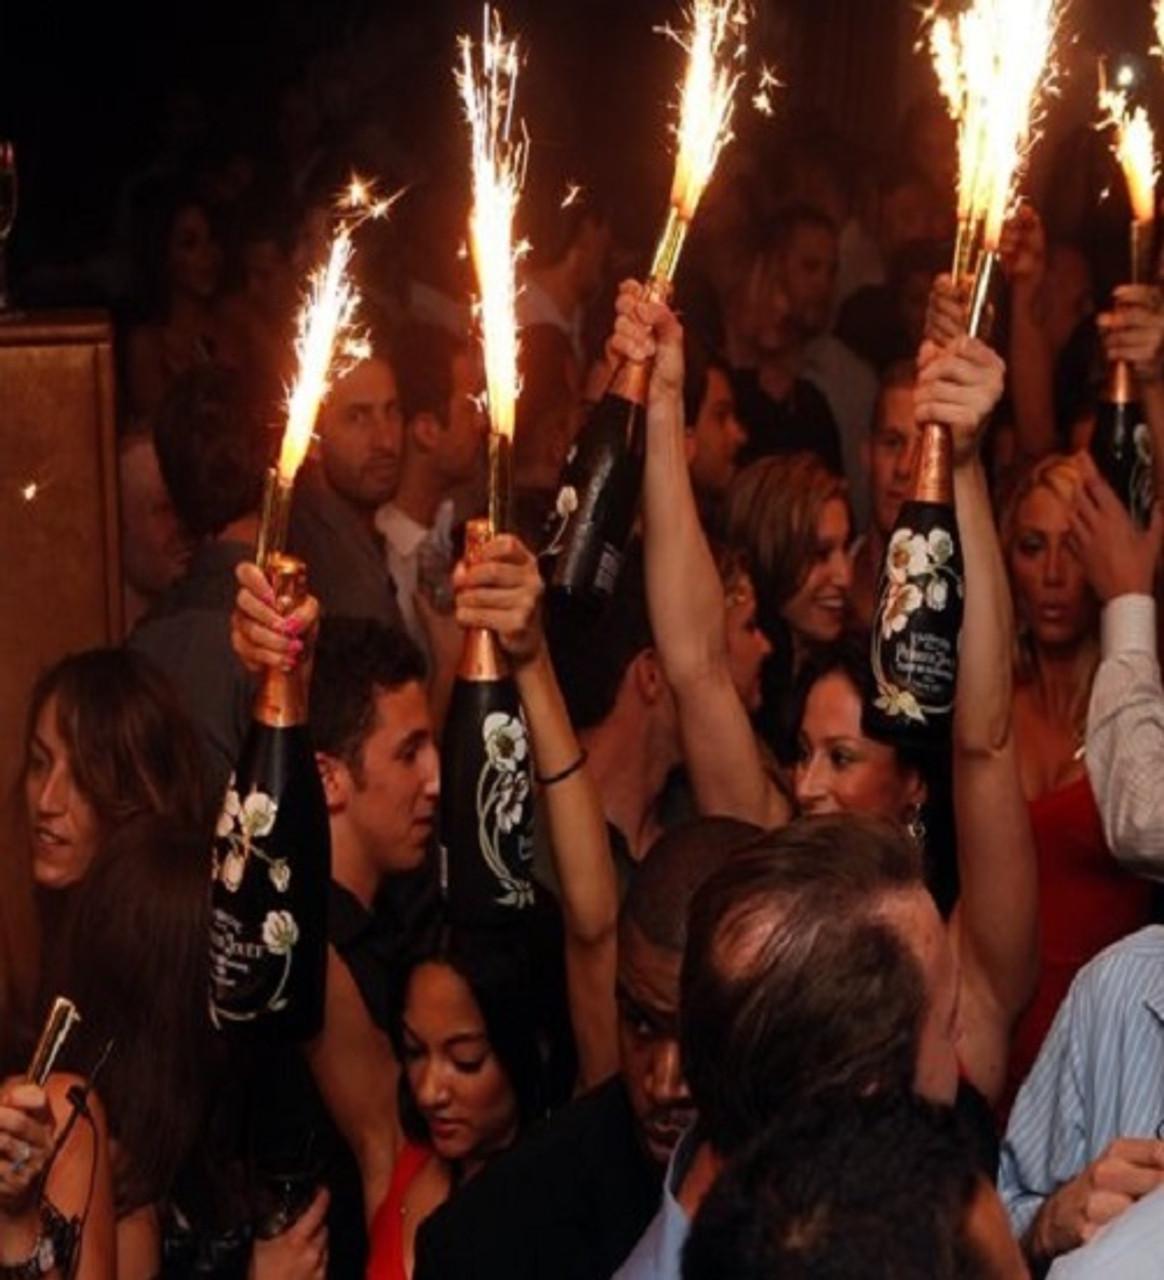 Nightlife Supplier Party Sparklers